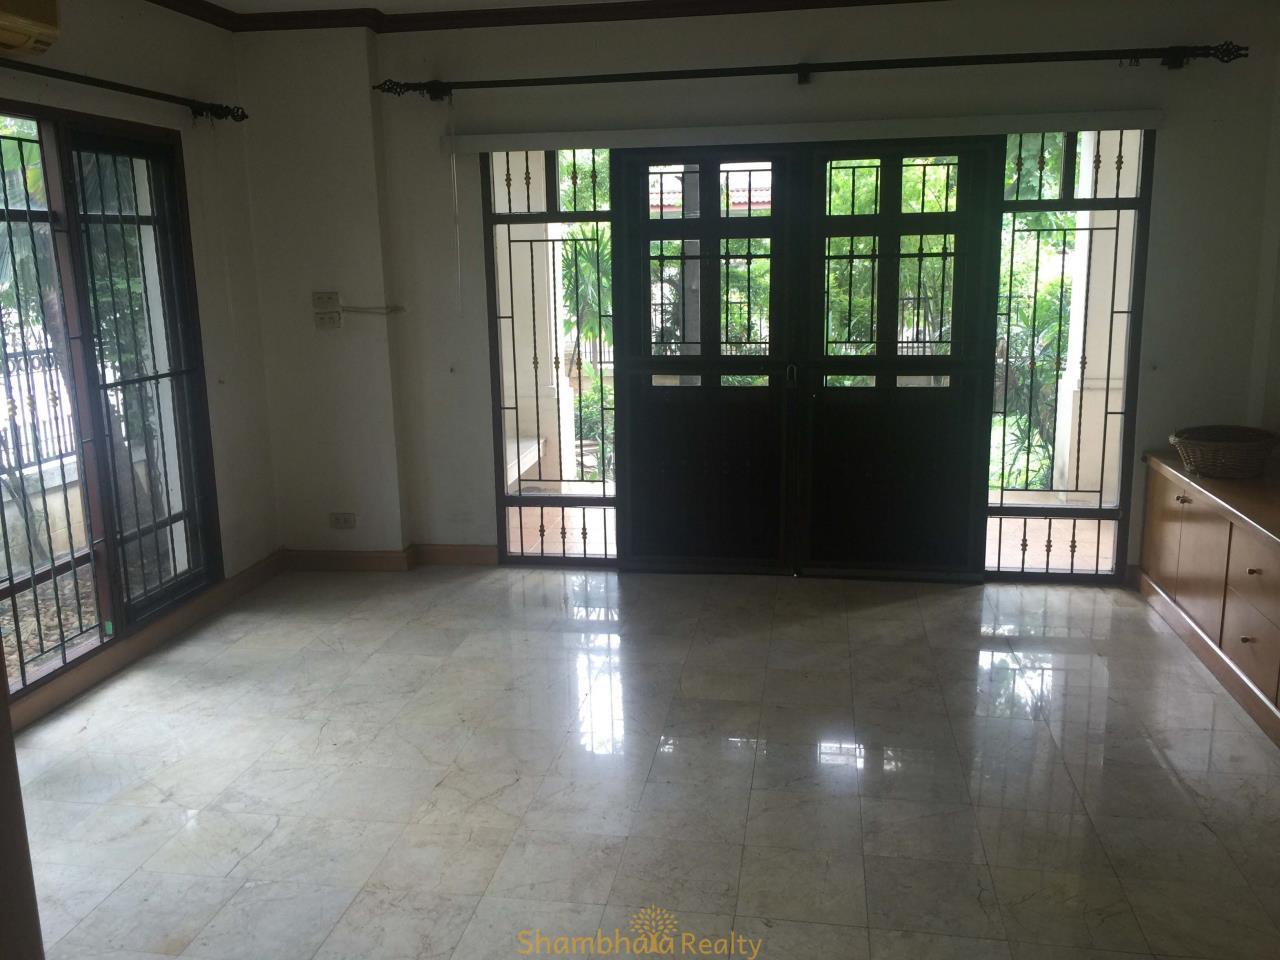 Shambhala Realty Agency's house is near Suvarnabhumi airport Condominium for Sale in Andress is 21 Romklow road 19/1 Kwangklongsam pravet, Khet Ladkrabang, Suvarnabhumi airport 10